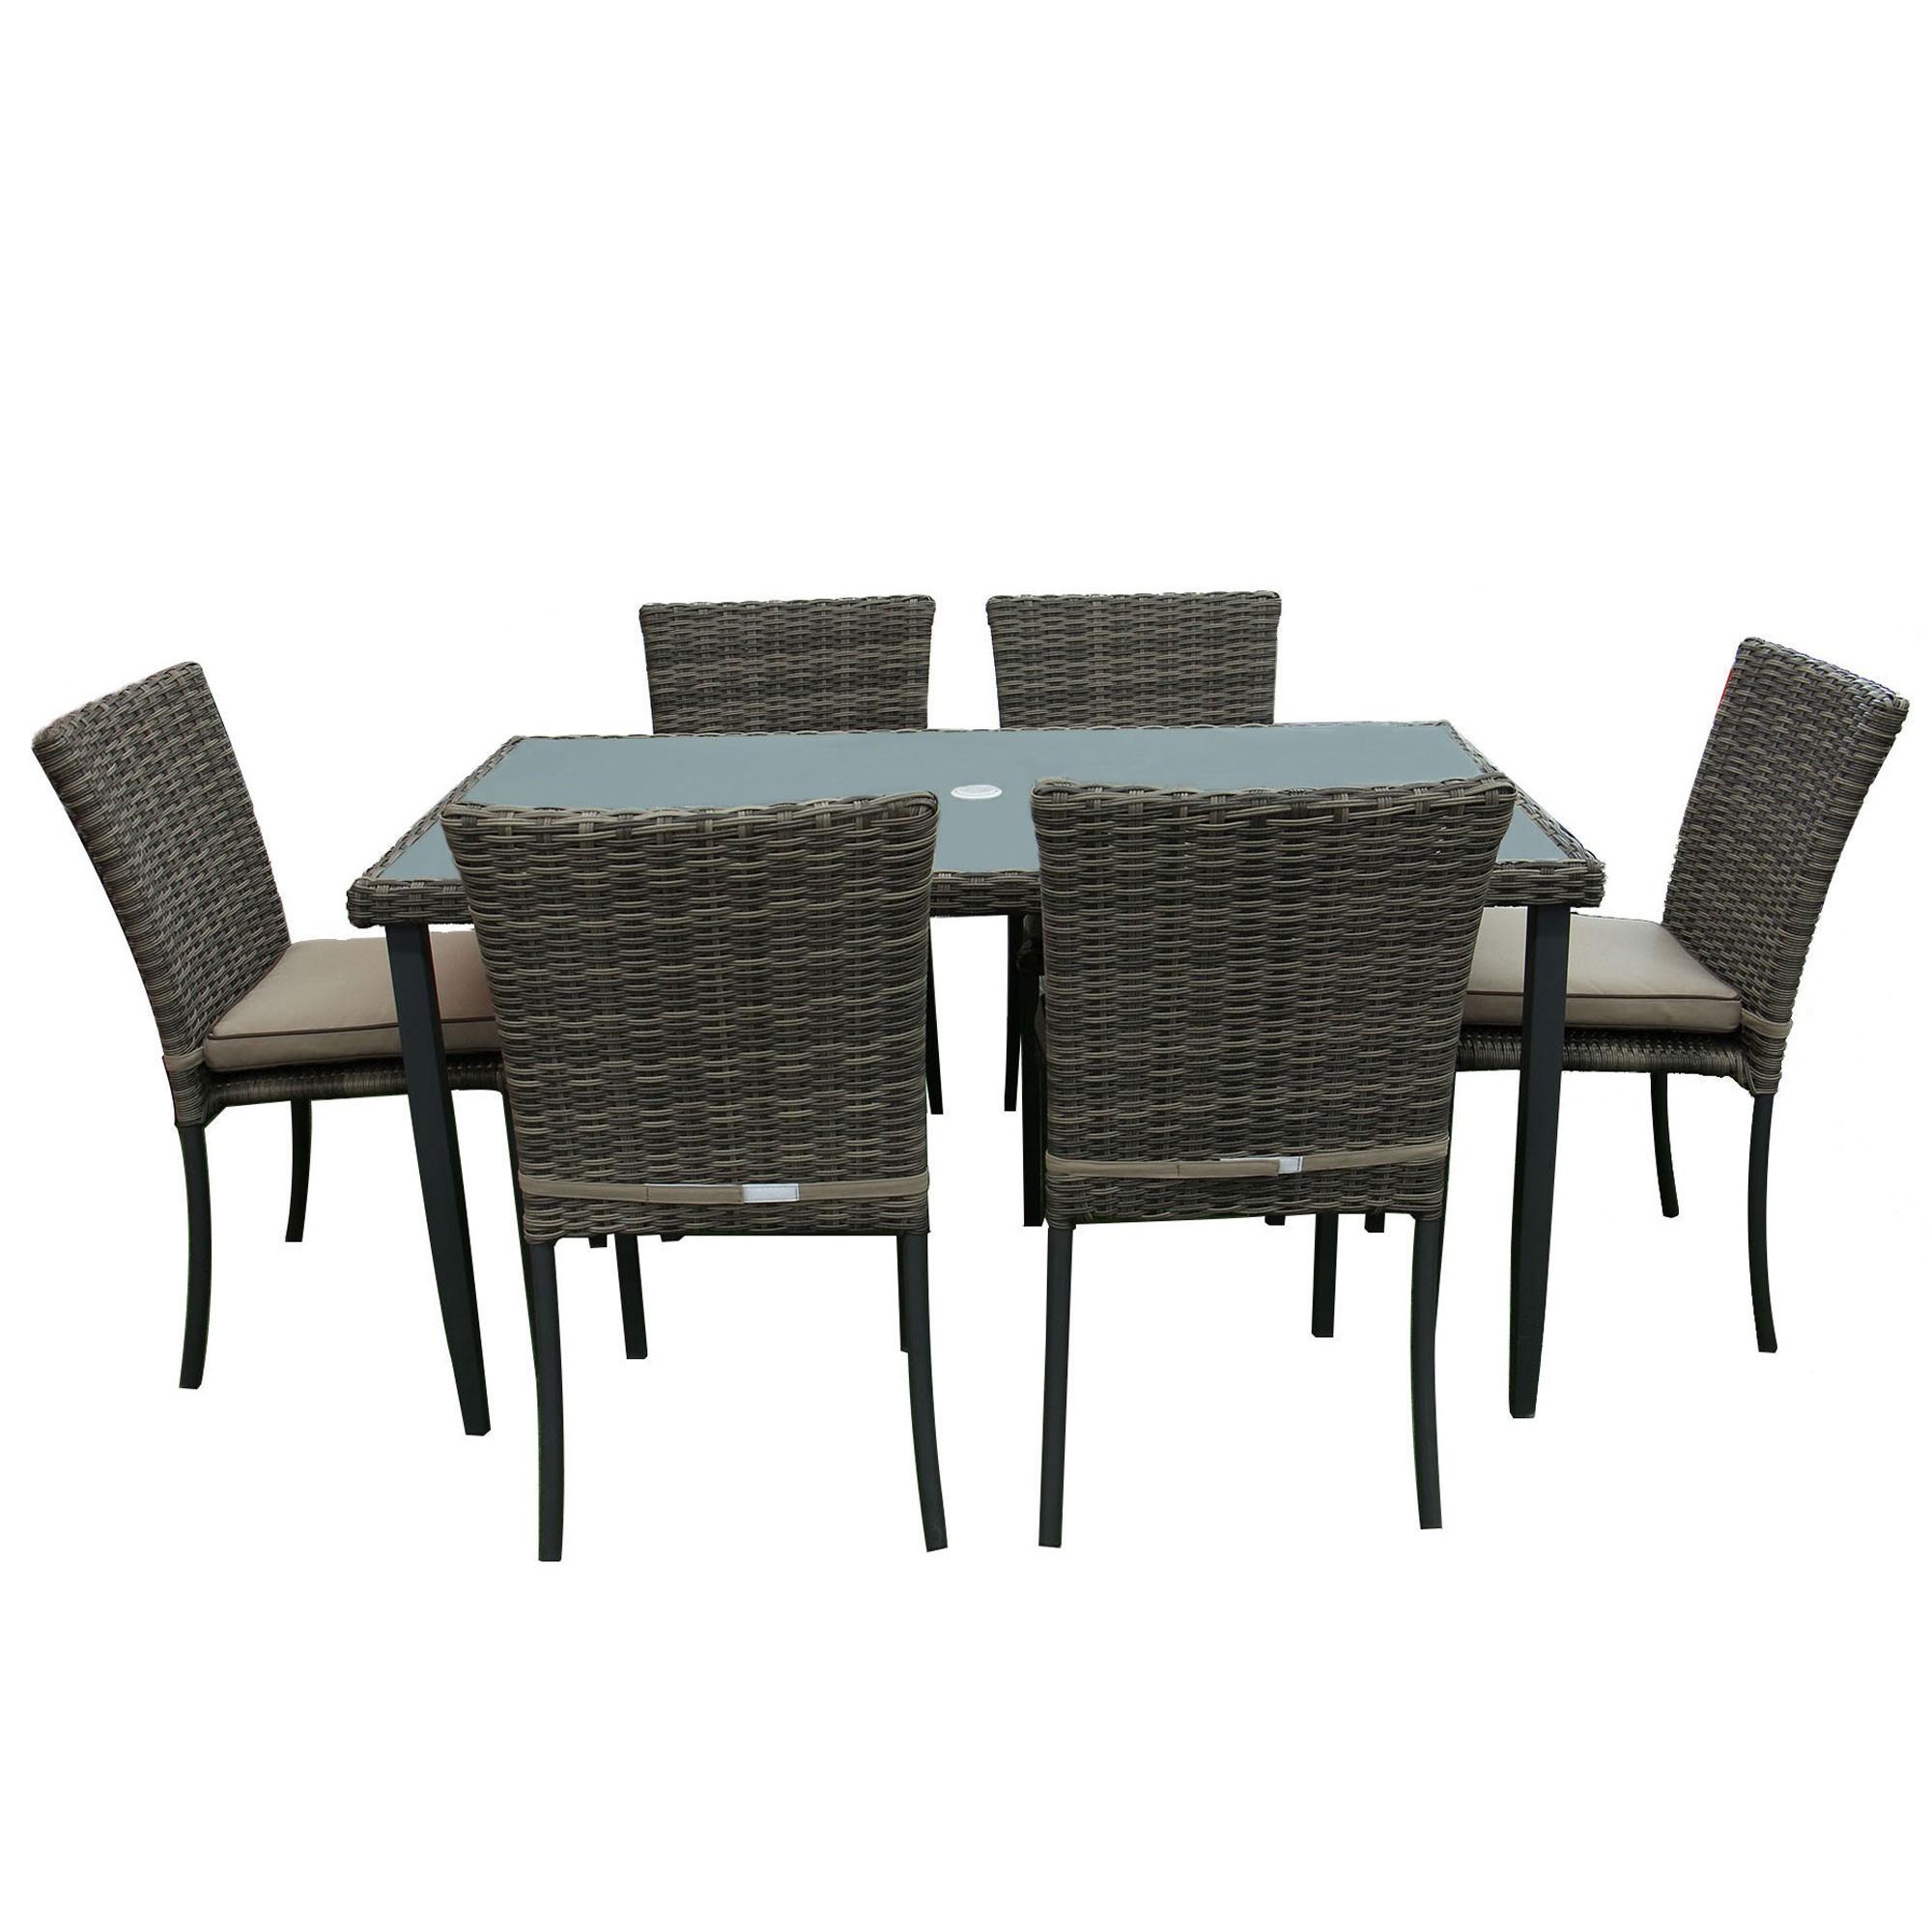 Dedeman set masa cu 6 scaune cu perne pentru gradina atena for Masa cu scaune dedeman